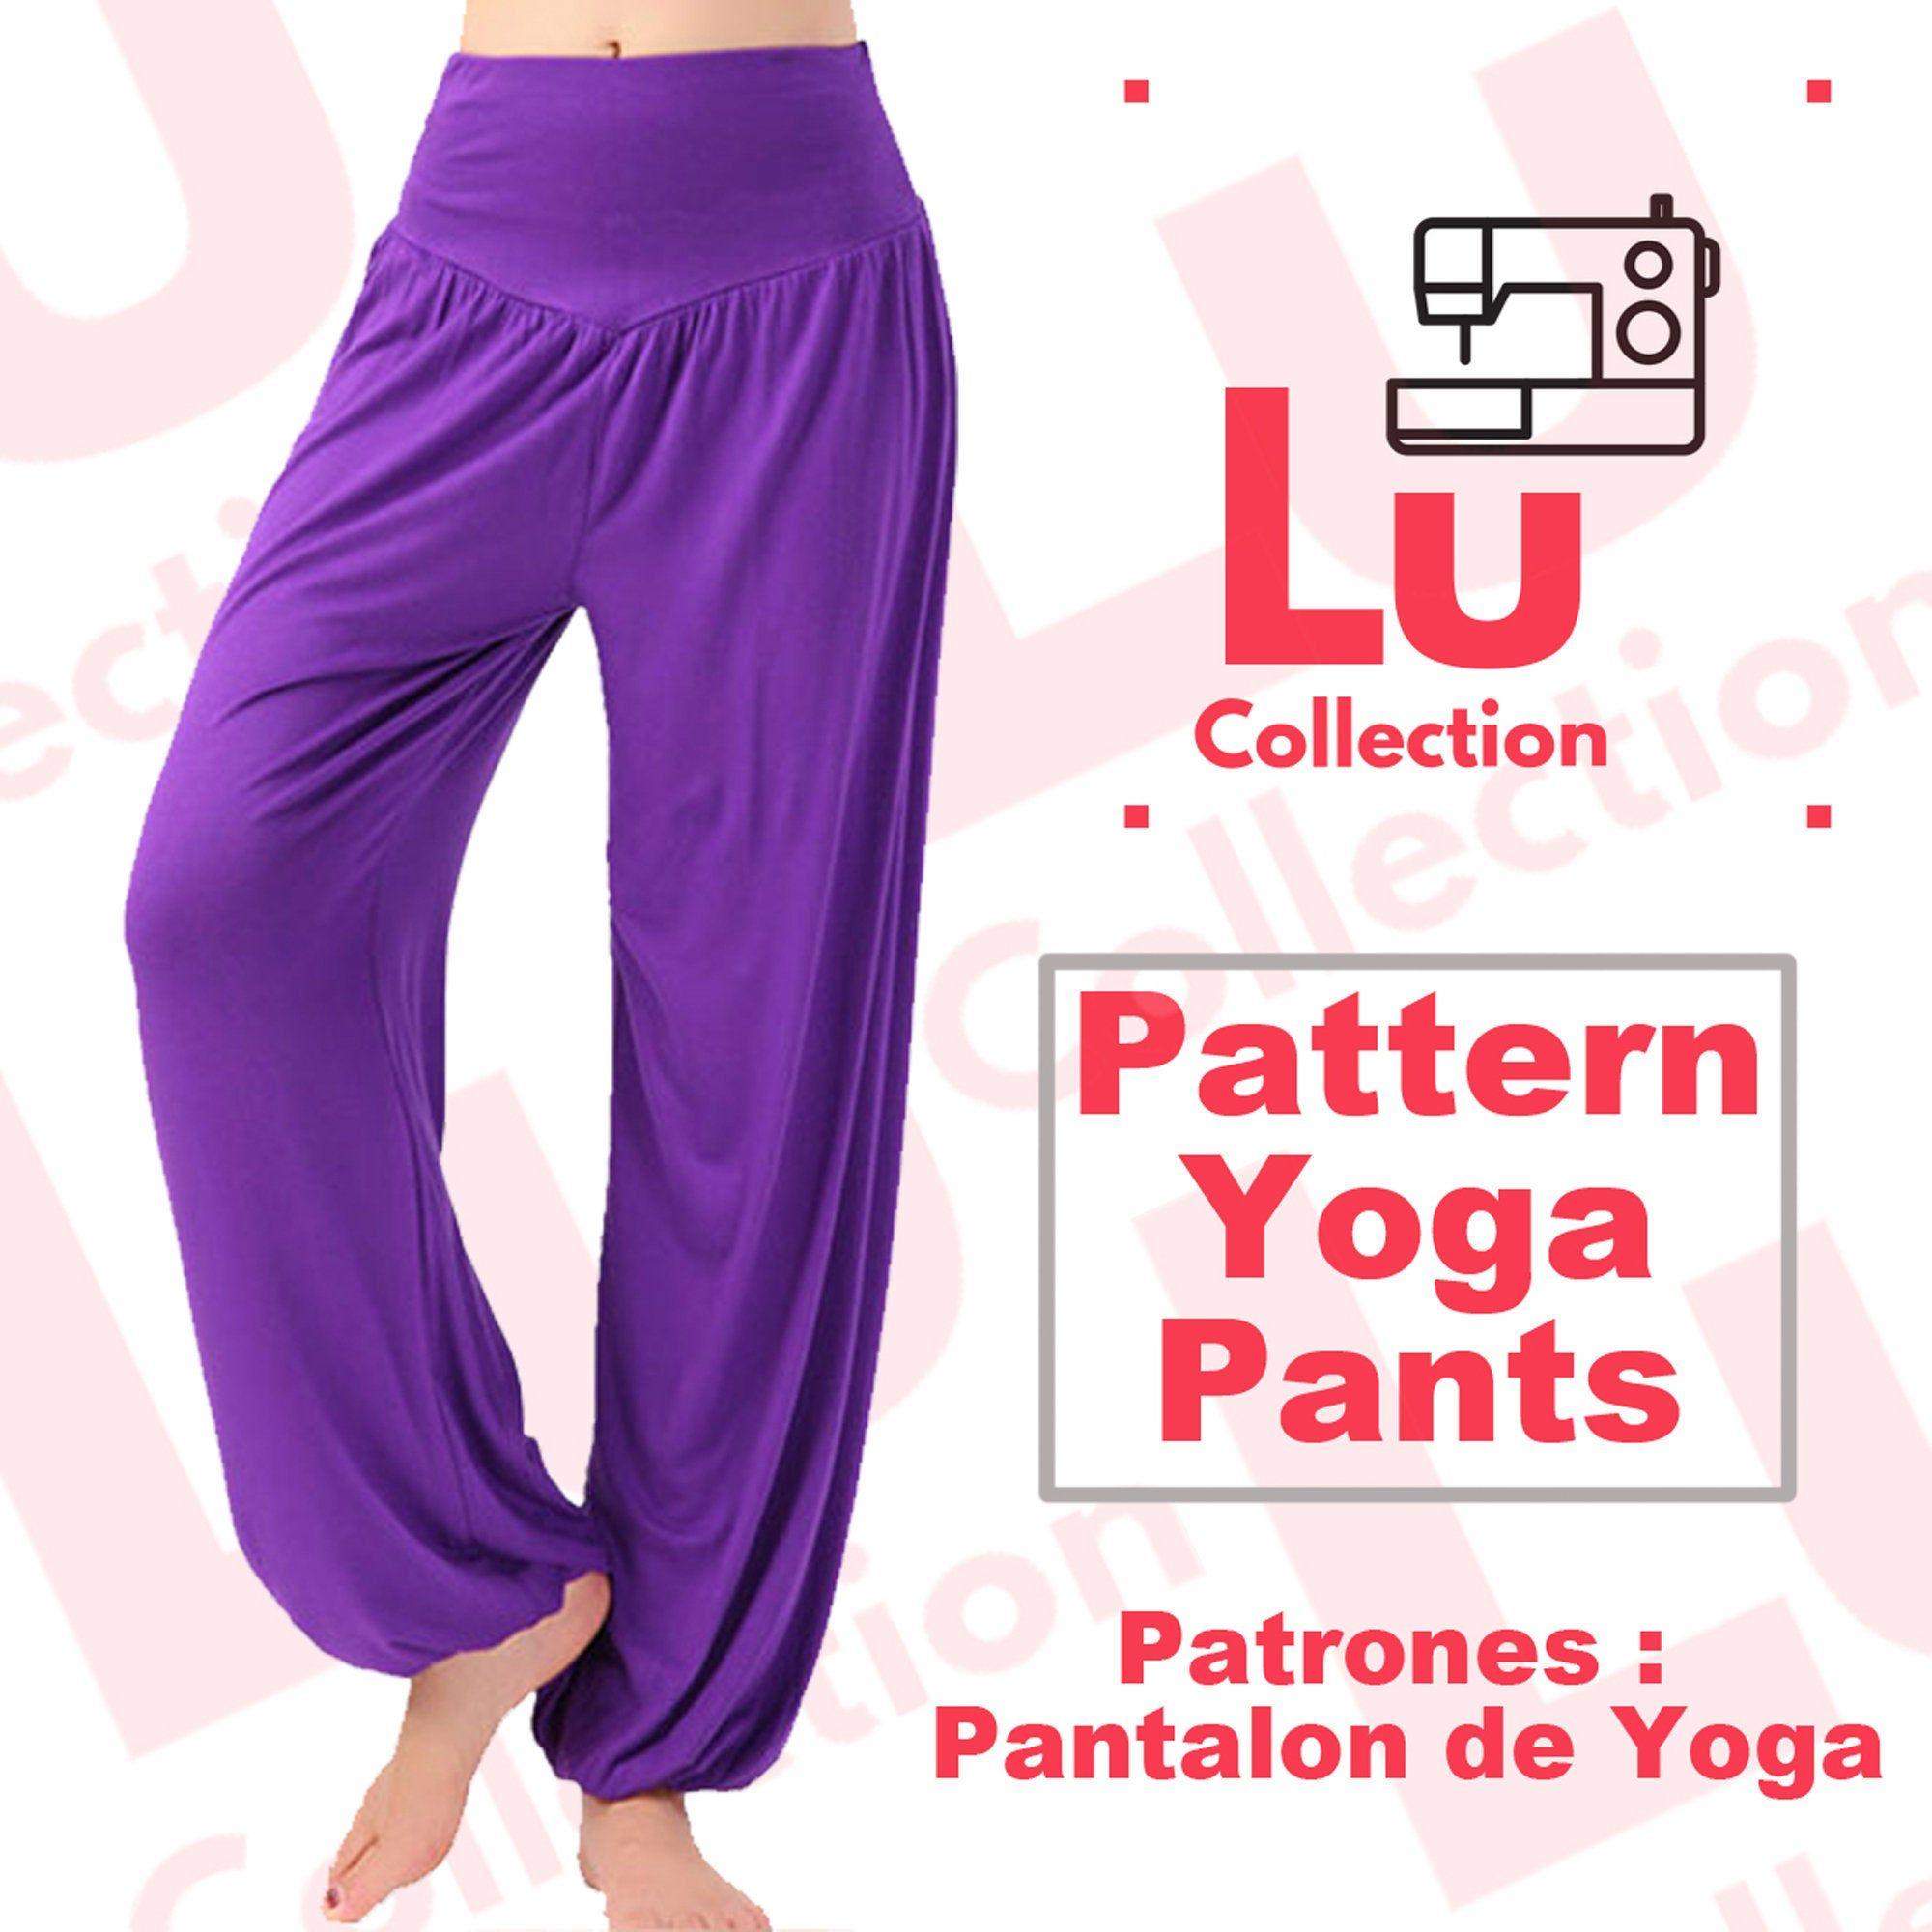 Patron Pants For Yoga Women Sewing Pattern Printable Pattern Pdf Pattern Pack Sizes S M L Immediate Download Free Shipping Yoga Women Yoga Sewing